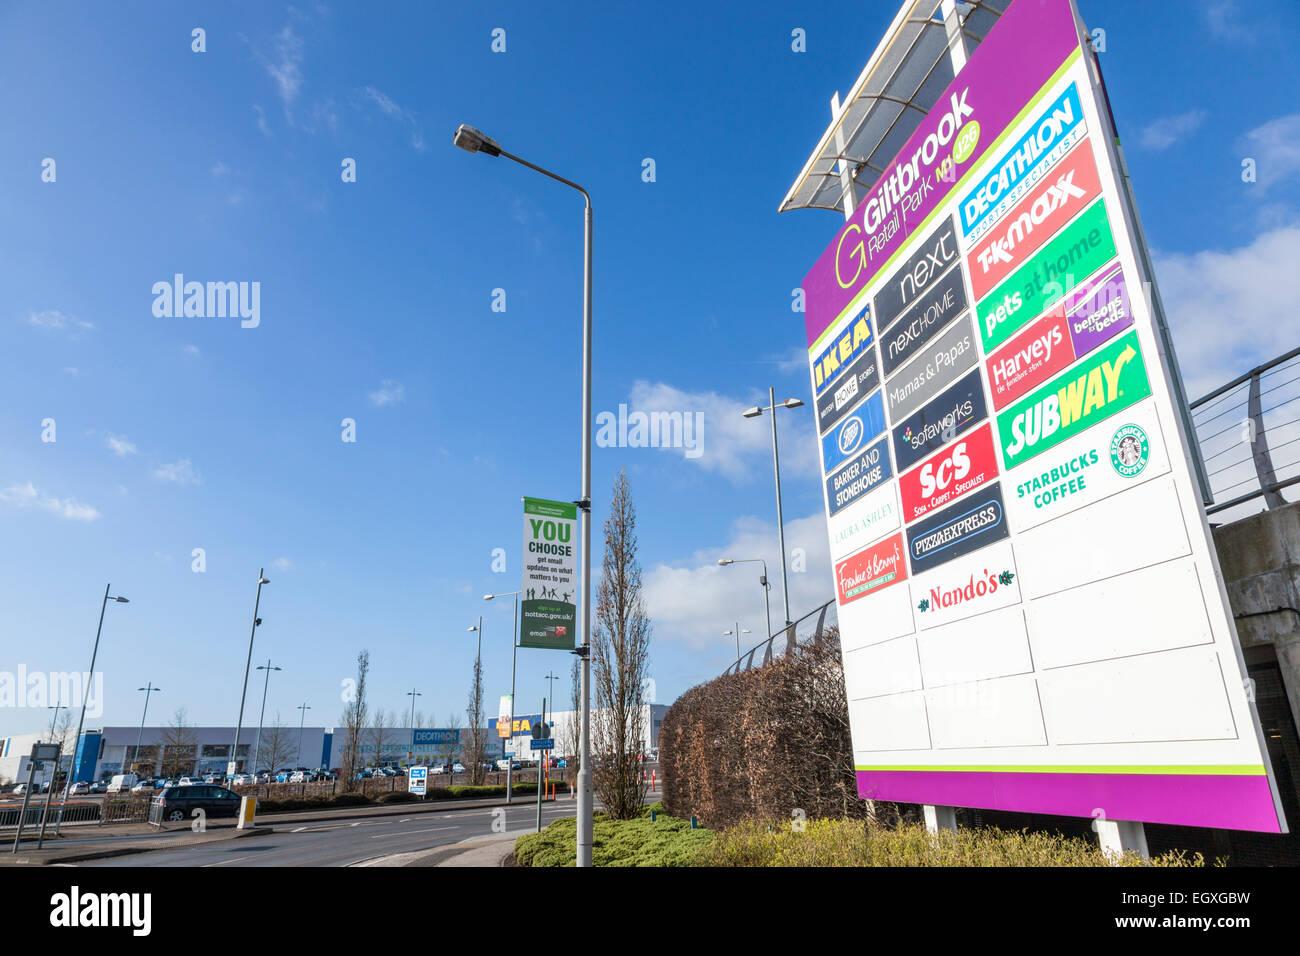 Giltbrook Retail Park, Nottinghamshire, England, UK - Stock Image